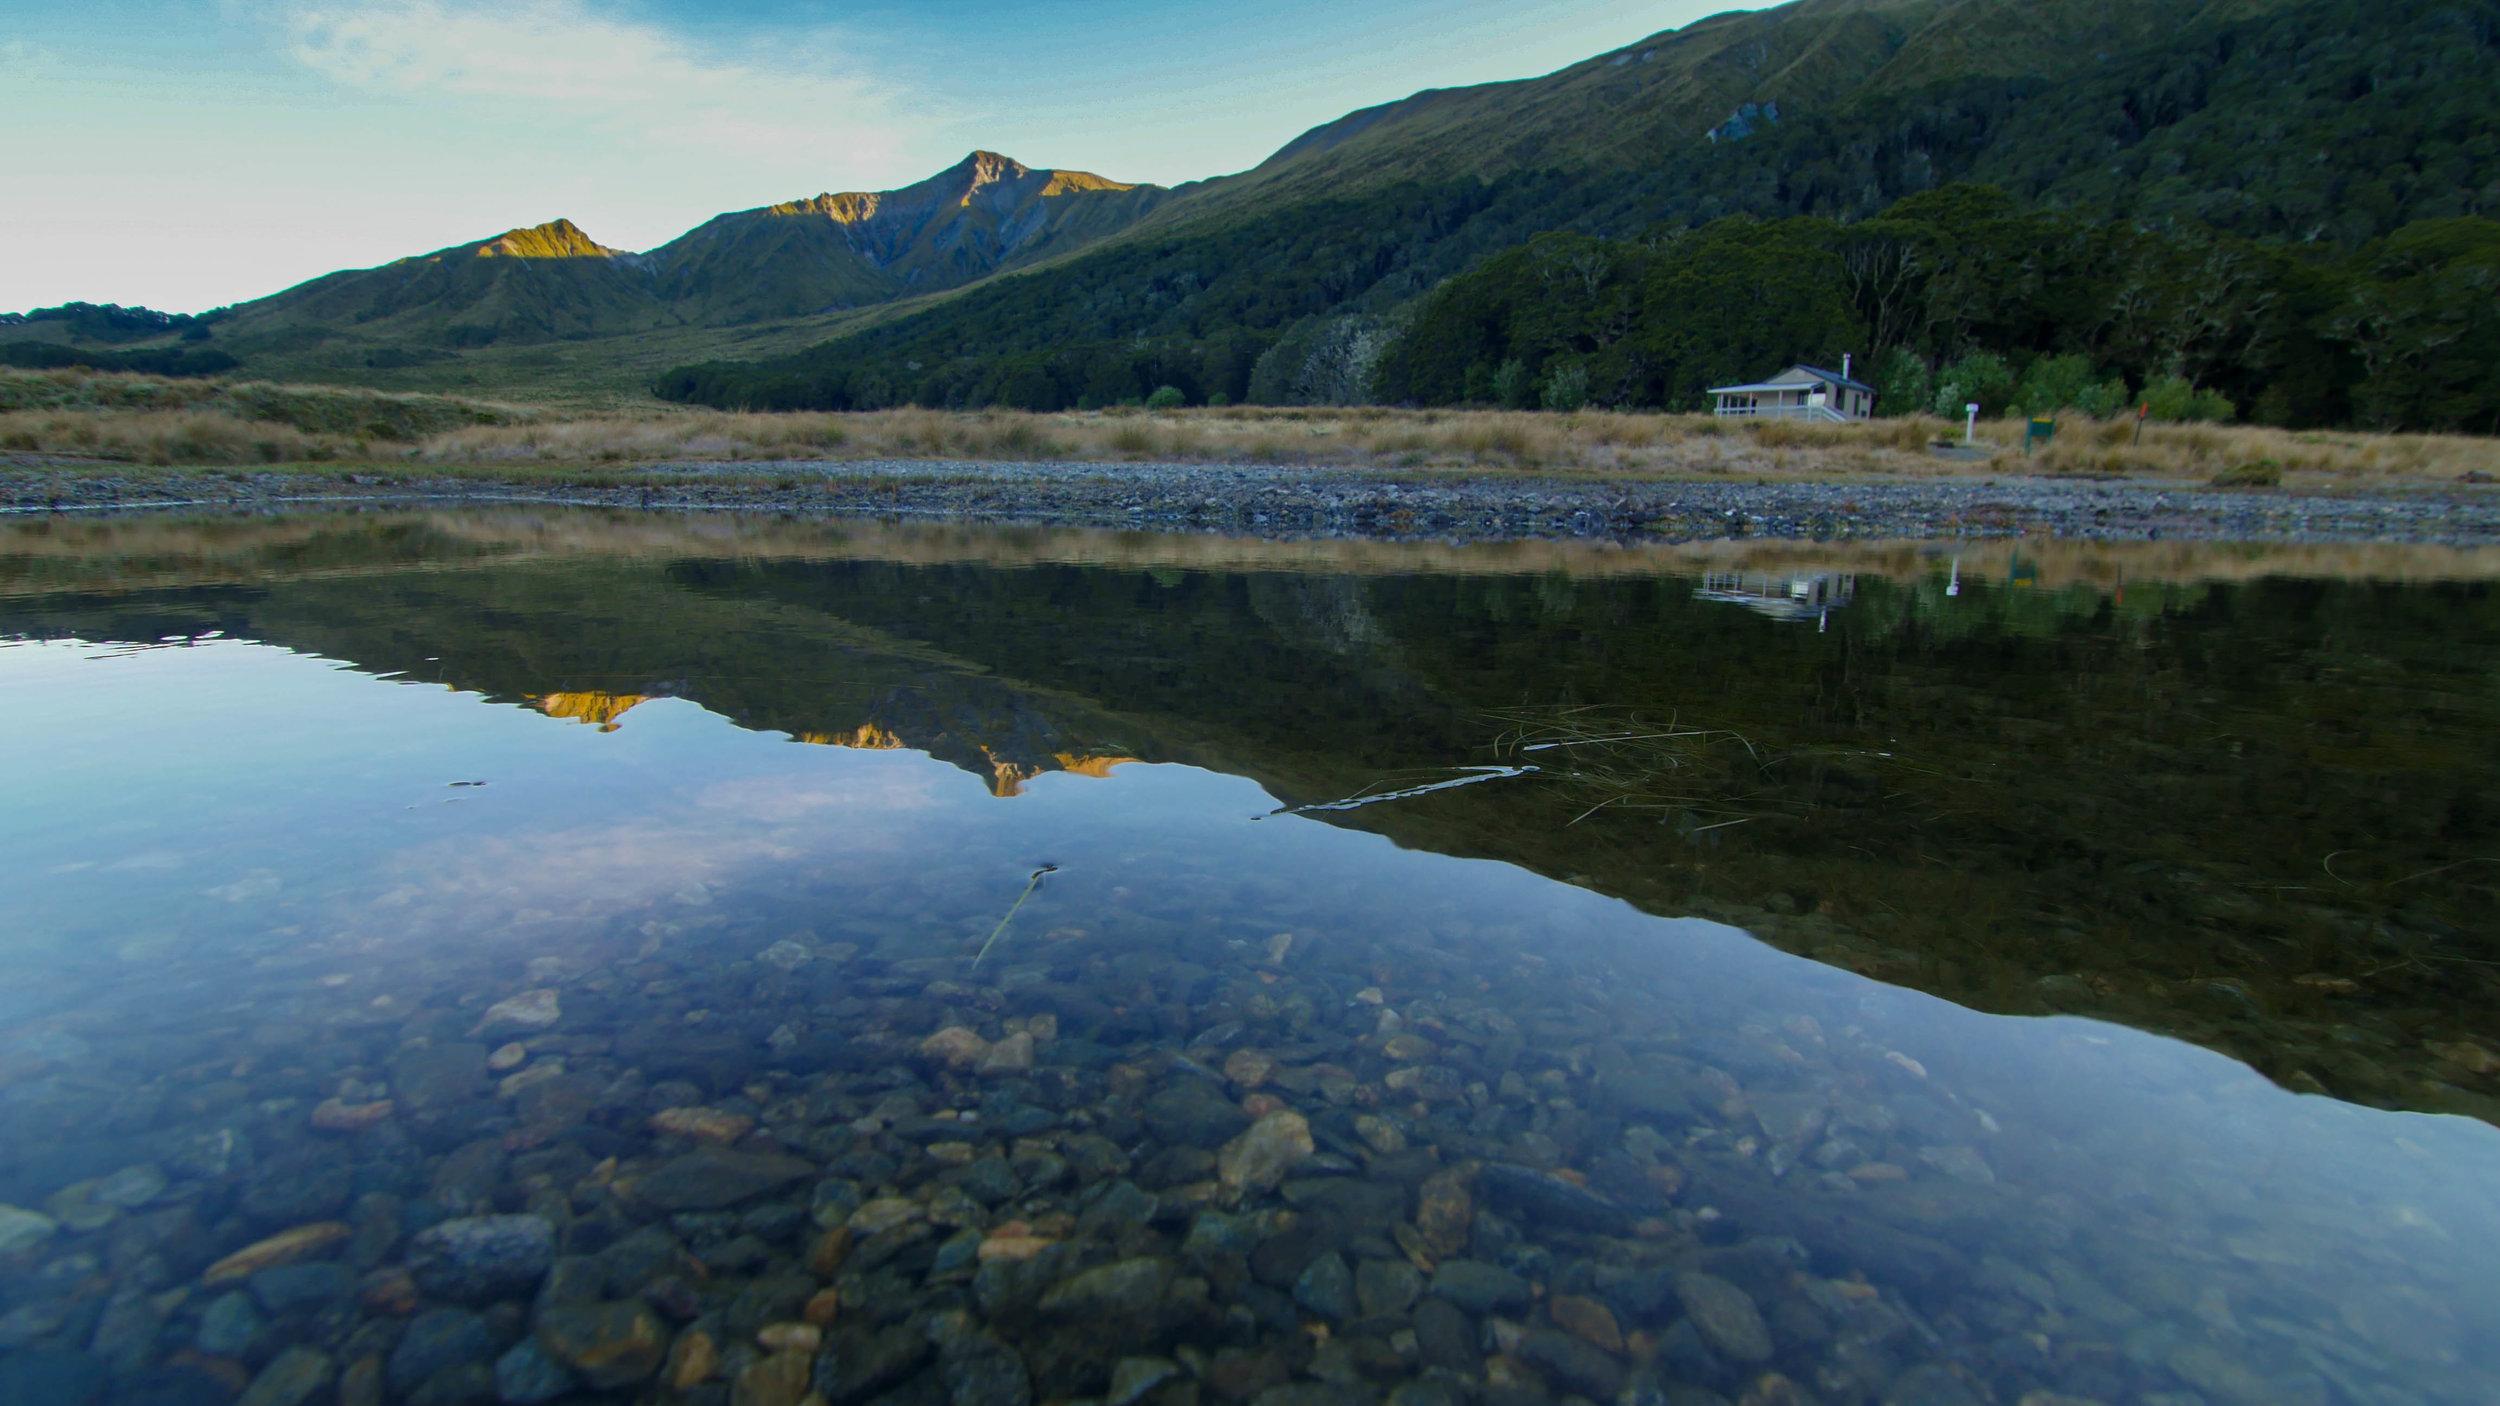 Green Lake Hut Lake Monowai Fiordland NAtional Park New Zealand (8 of 9).jpg